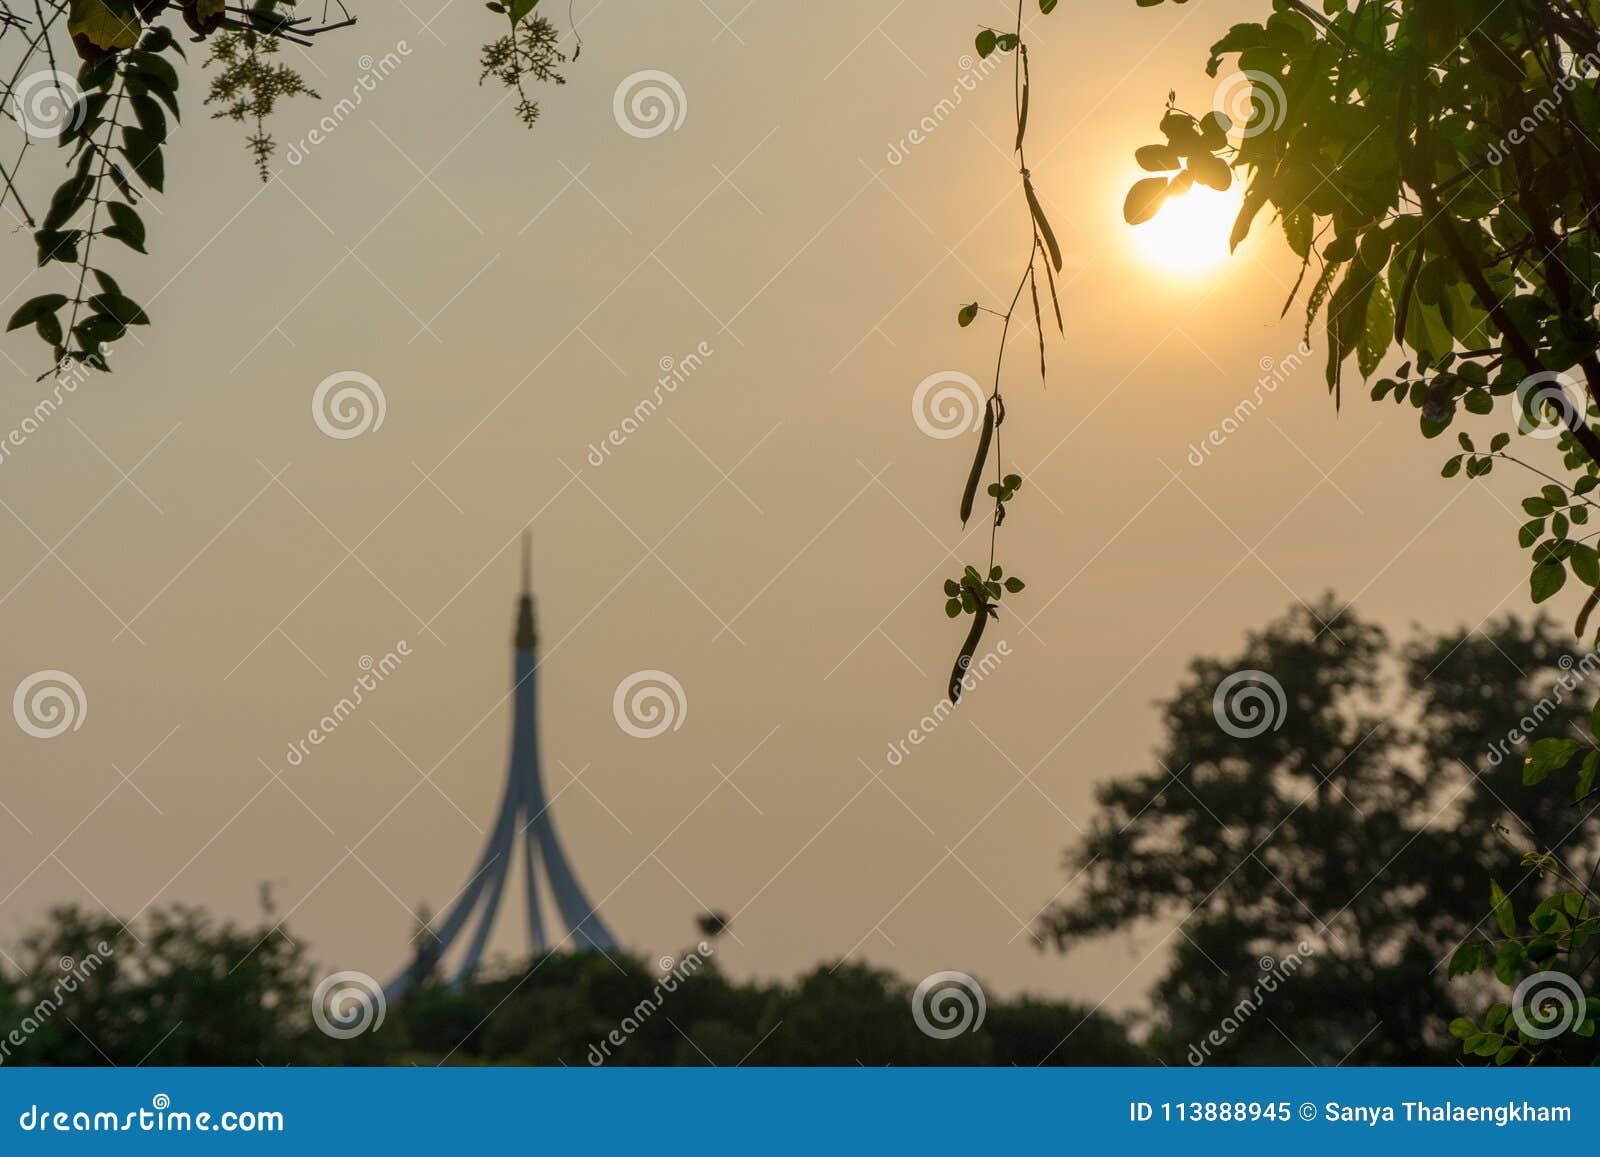 Заход солнца сегодня освещает